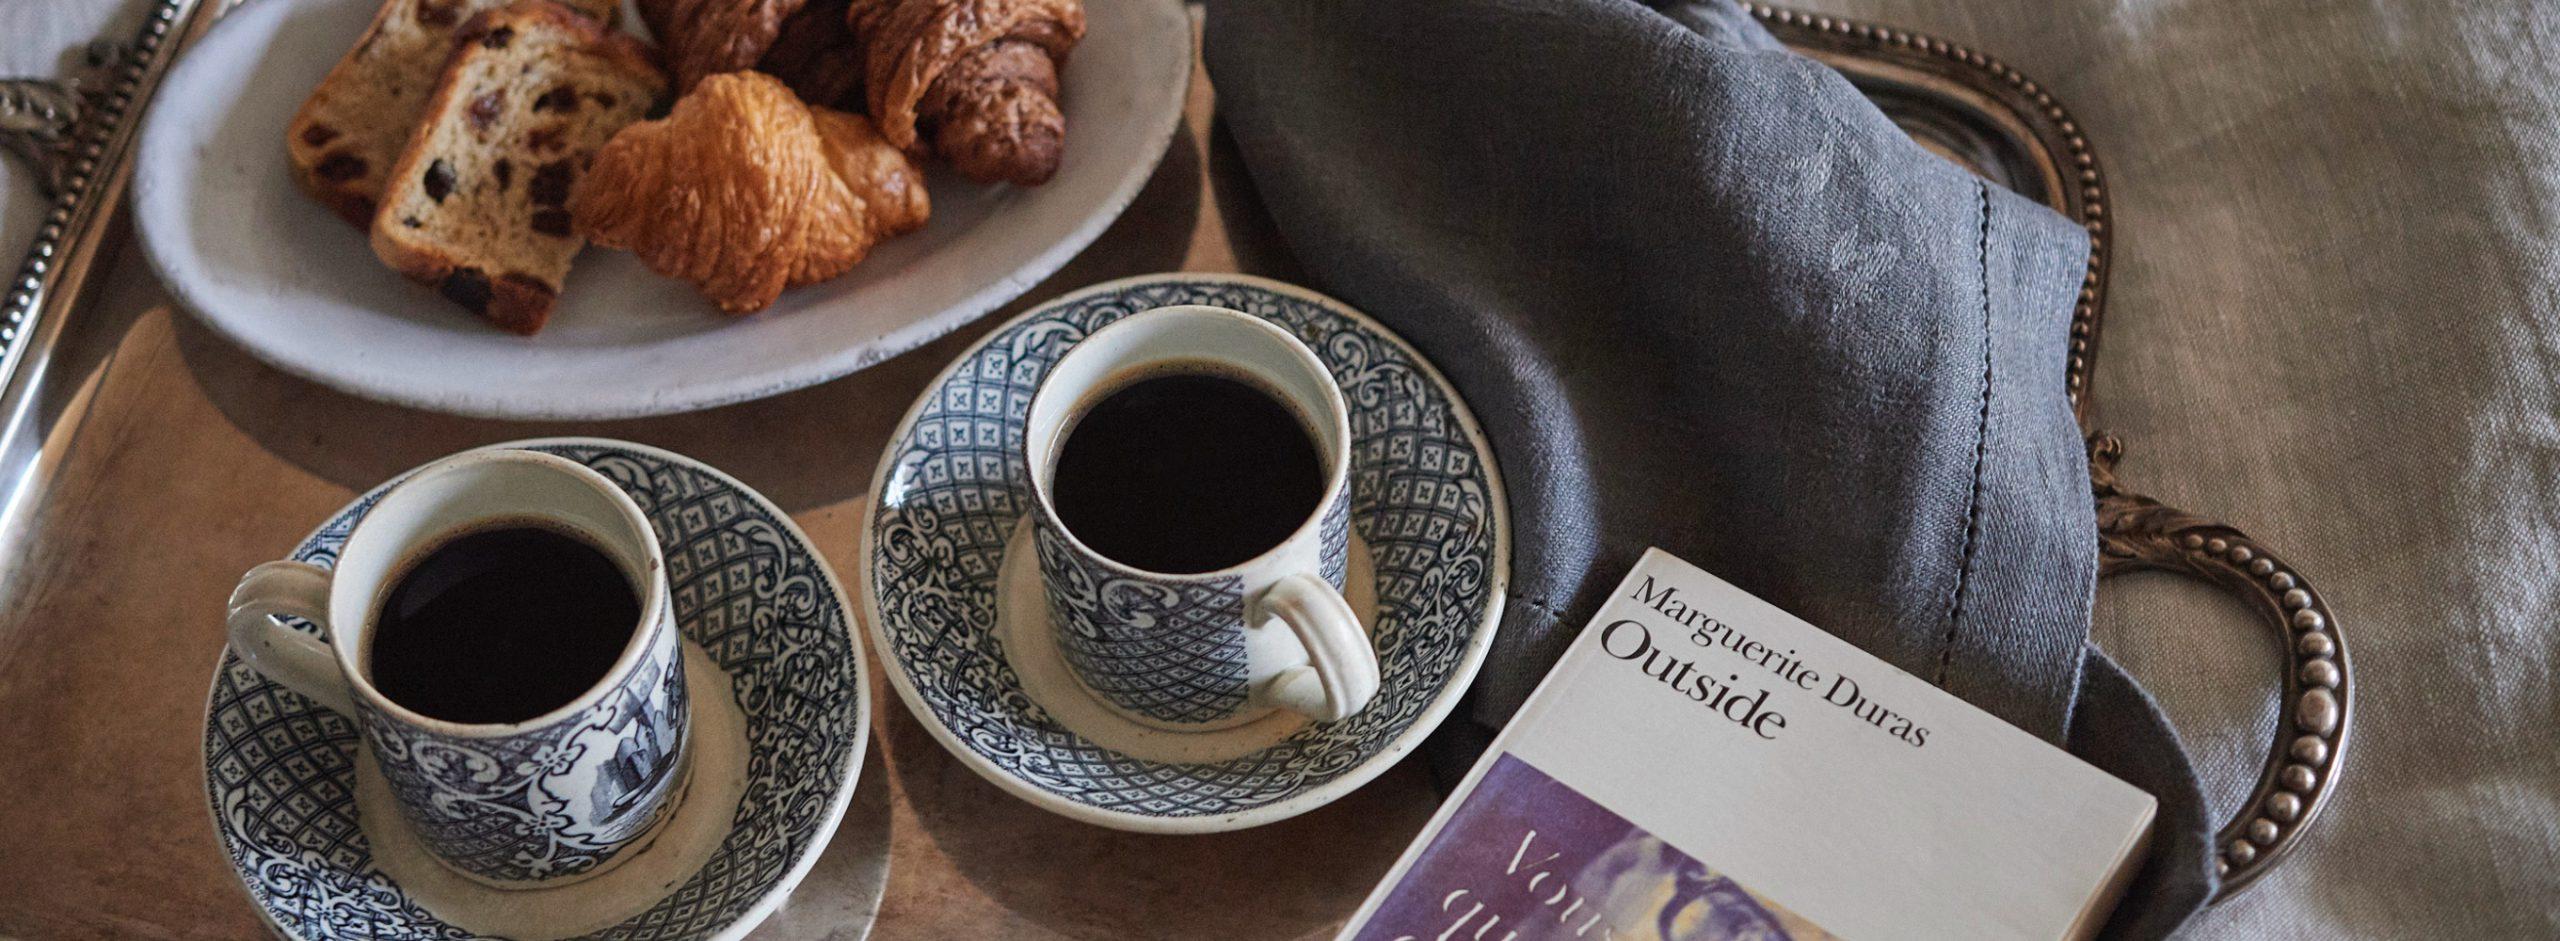 Grasse Matinée――日曜の朝、お気に入りの寝室で楽しむ優雅な朝食